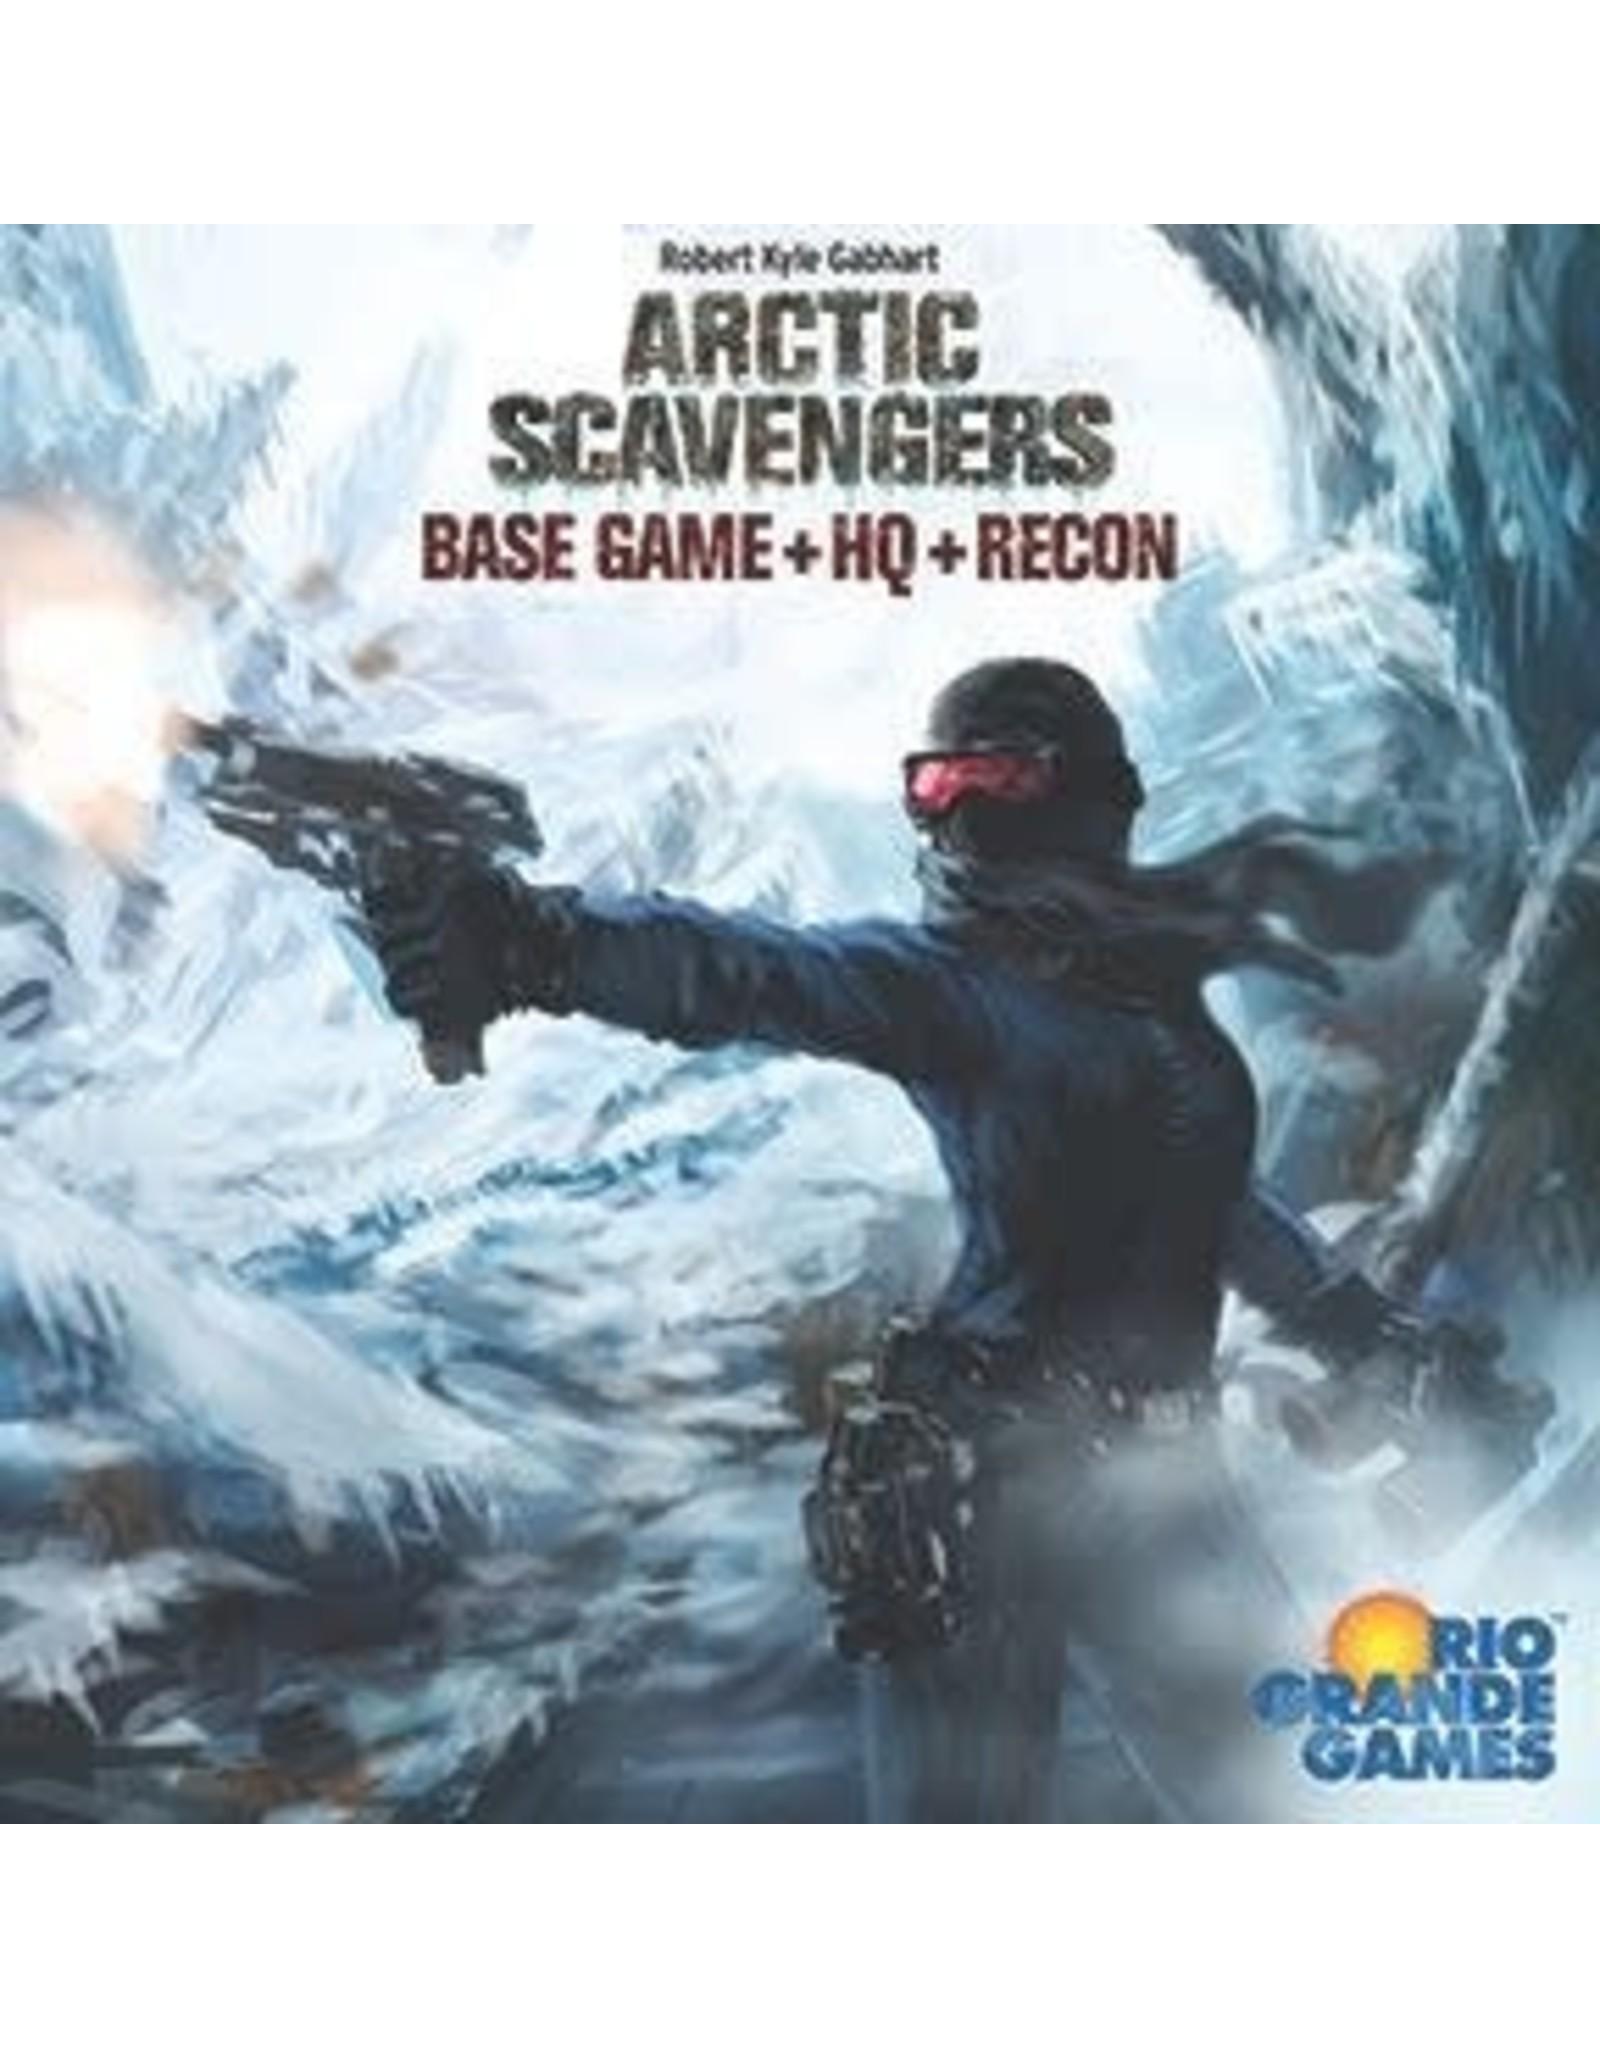 ARCTIC SCAVENGERS BASE GAME + HQ + RECON